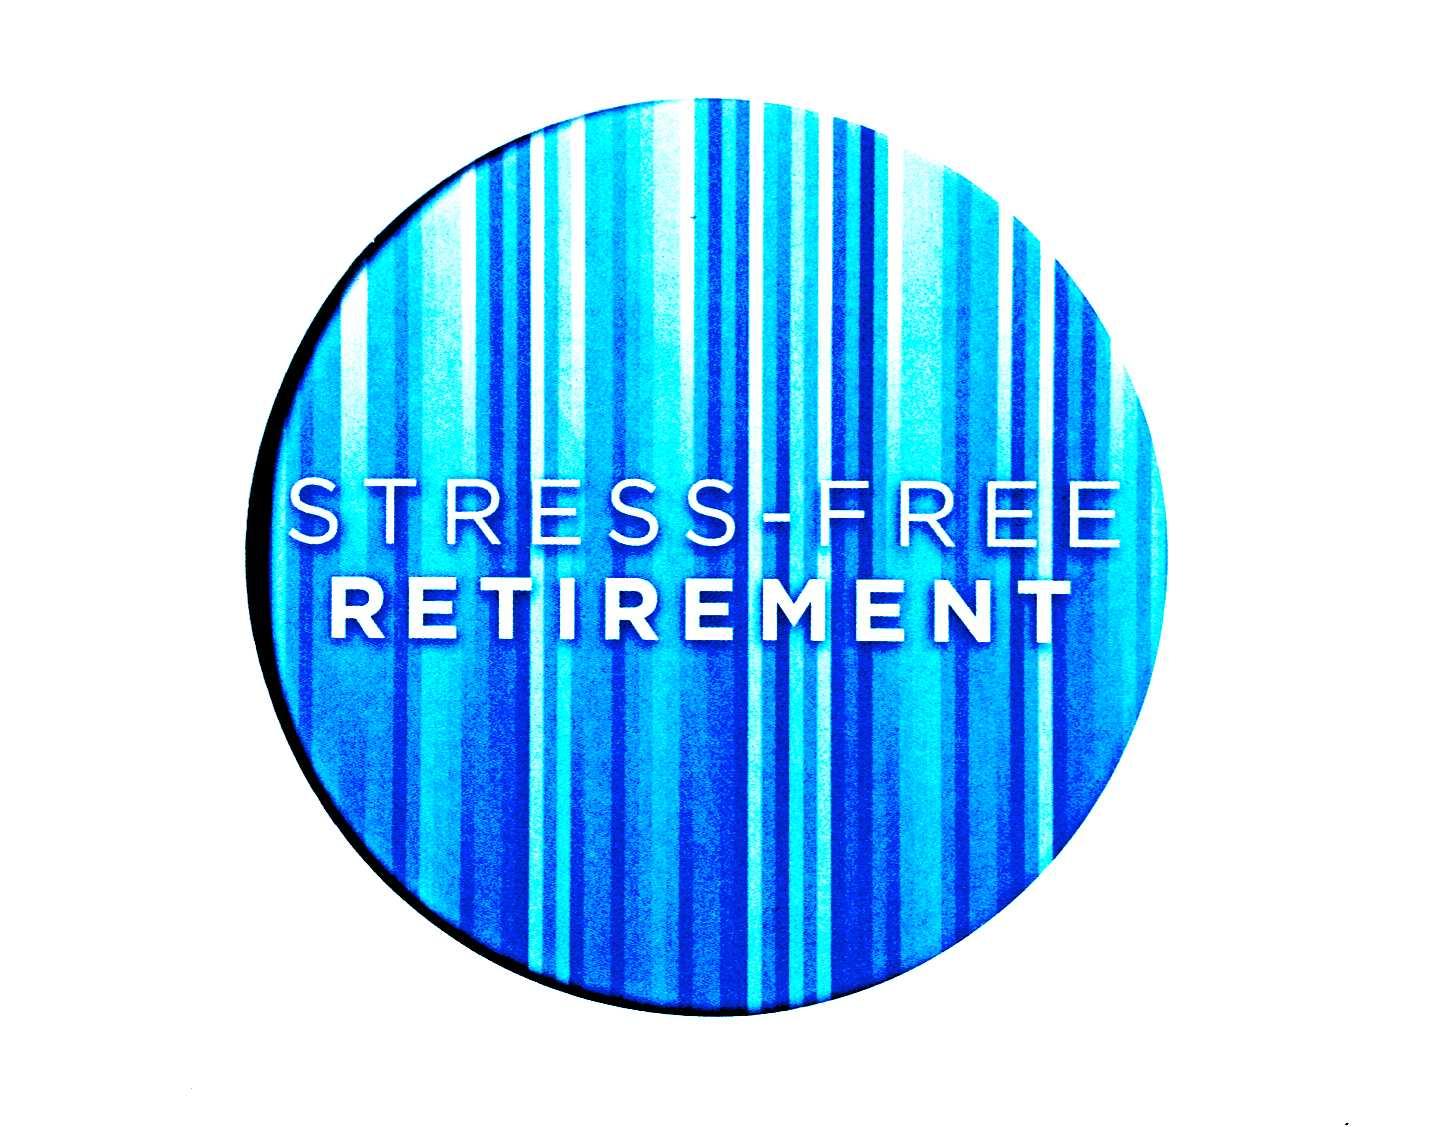 Stress-Free Retirement